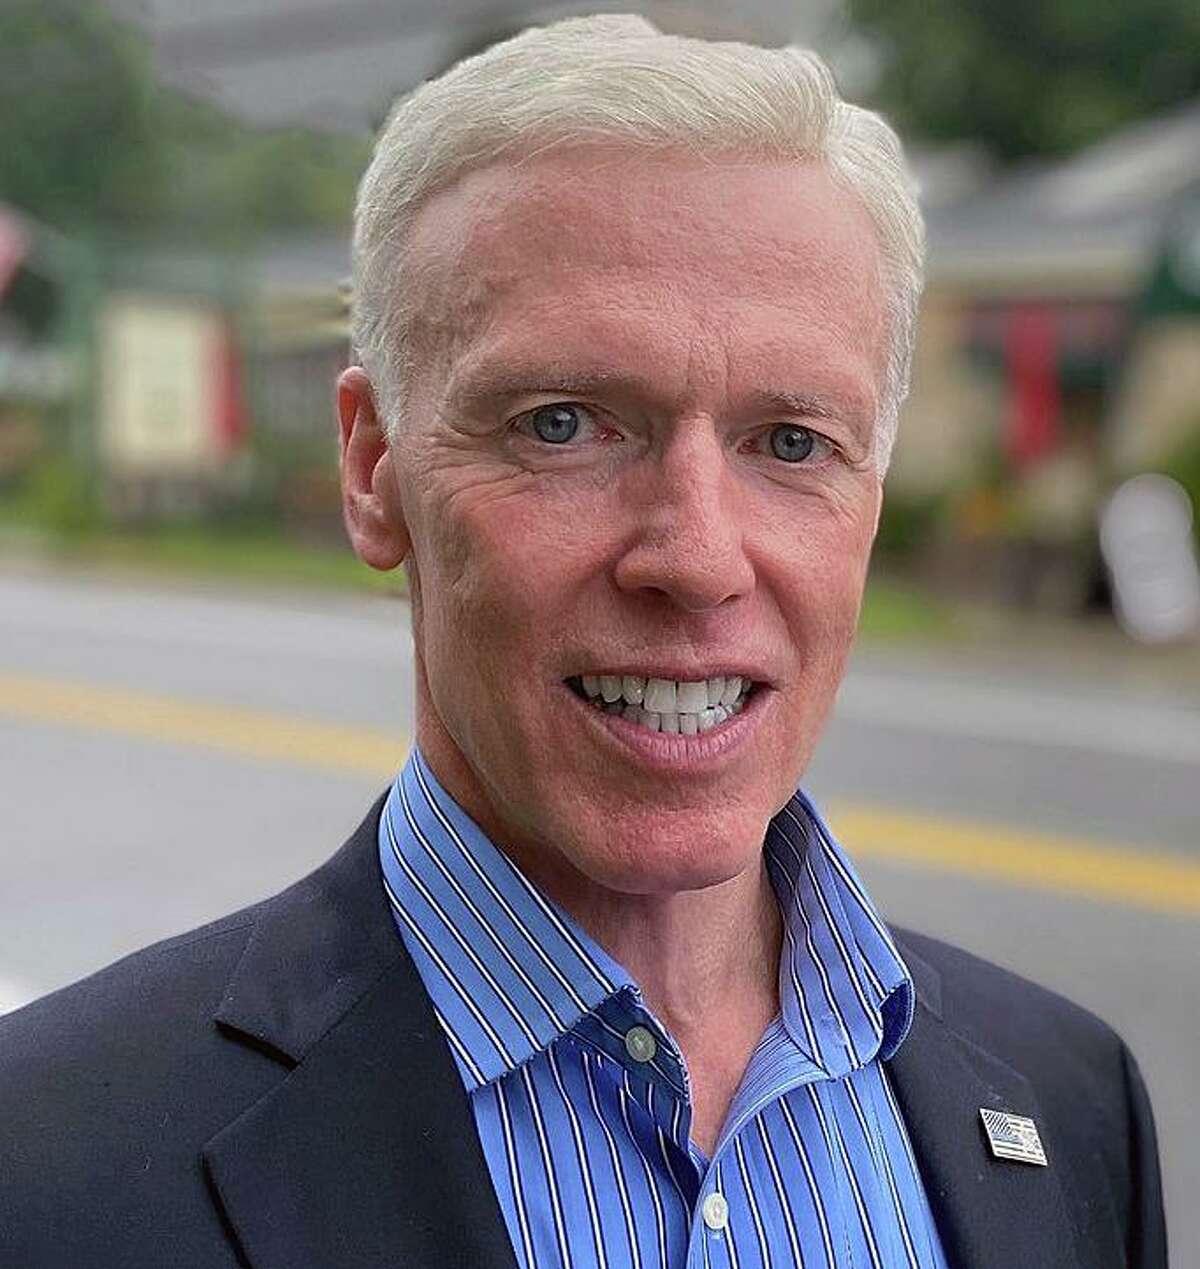 David X. Sullivan, Republican candidate for Connecticut's 5th Congressional District.